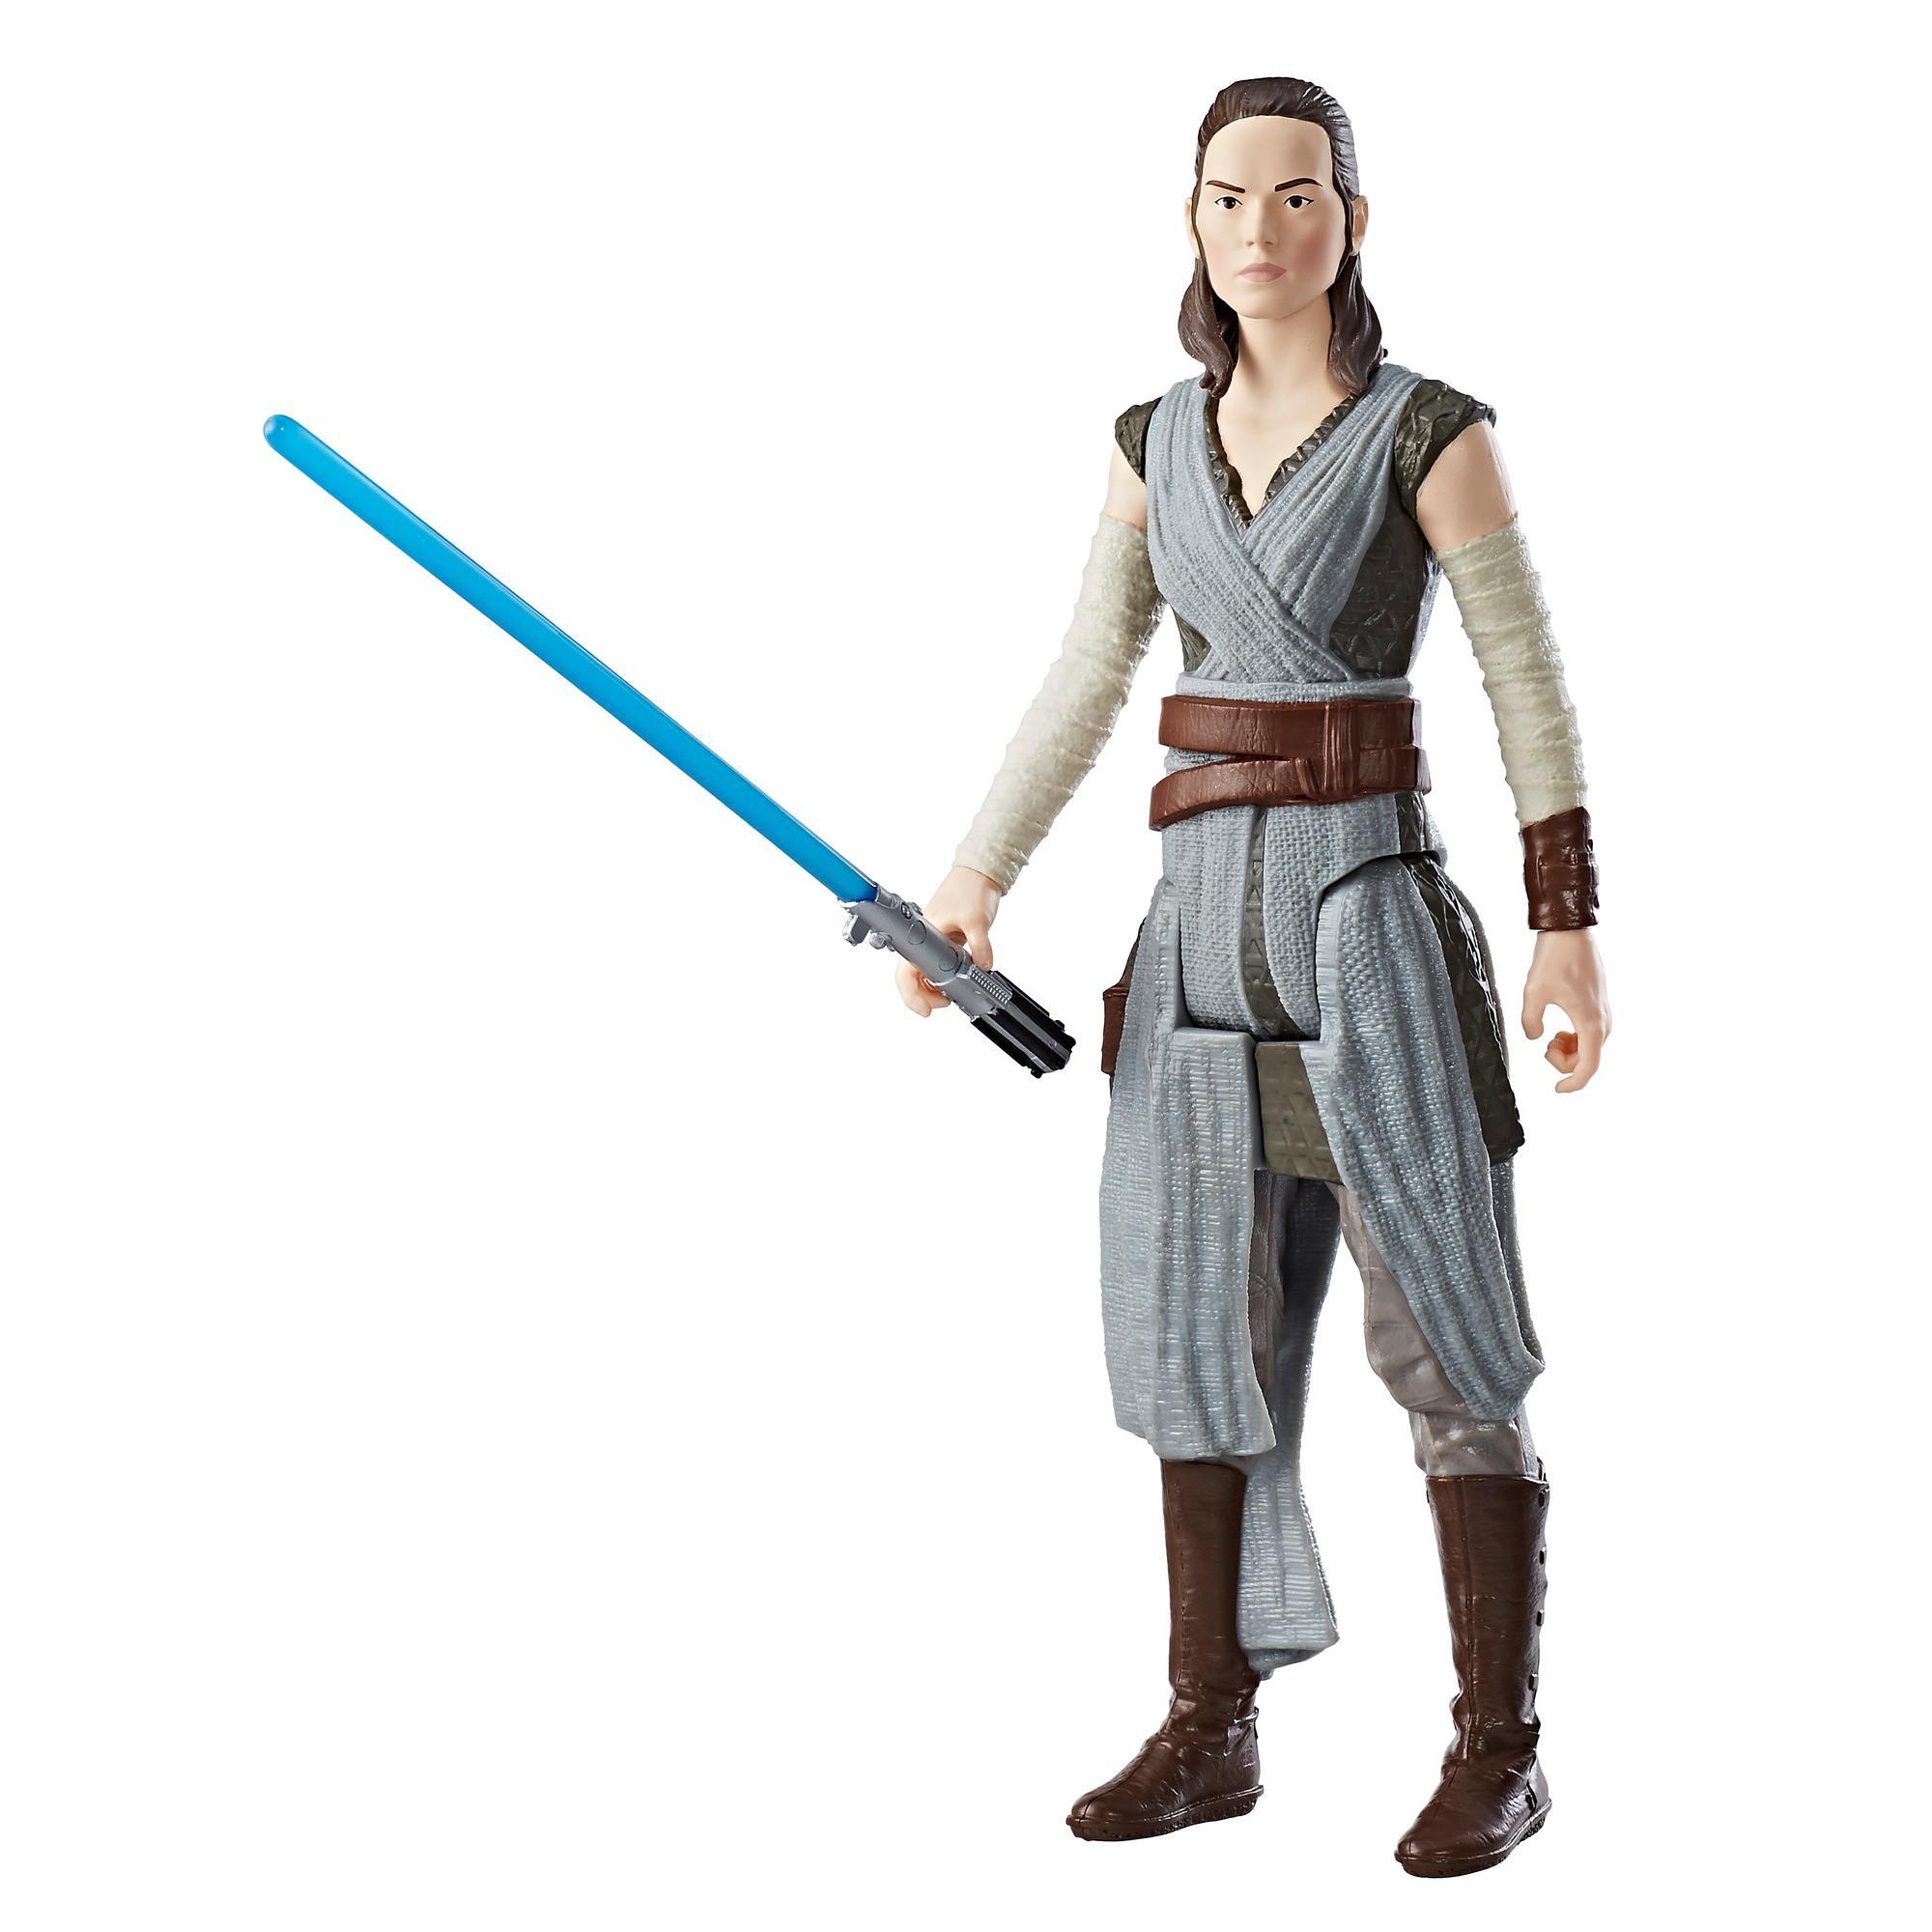 Star Wars : Les Derniers Jedi - Figurine de 30 cm Rey (Entraînement Jedi)